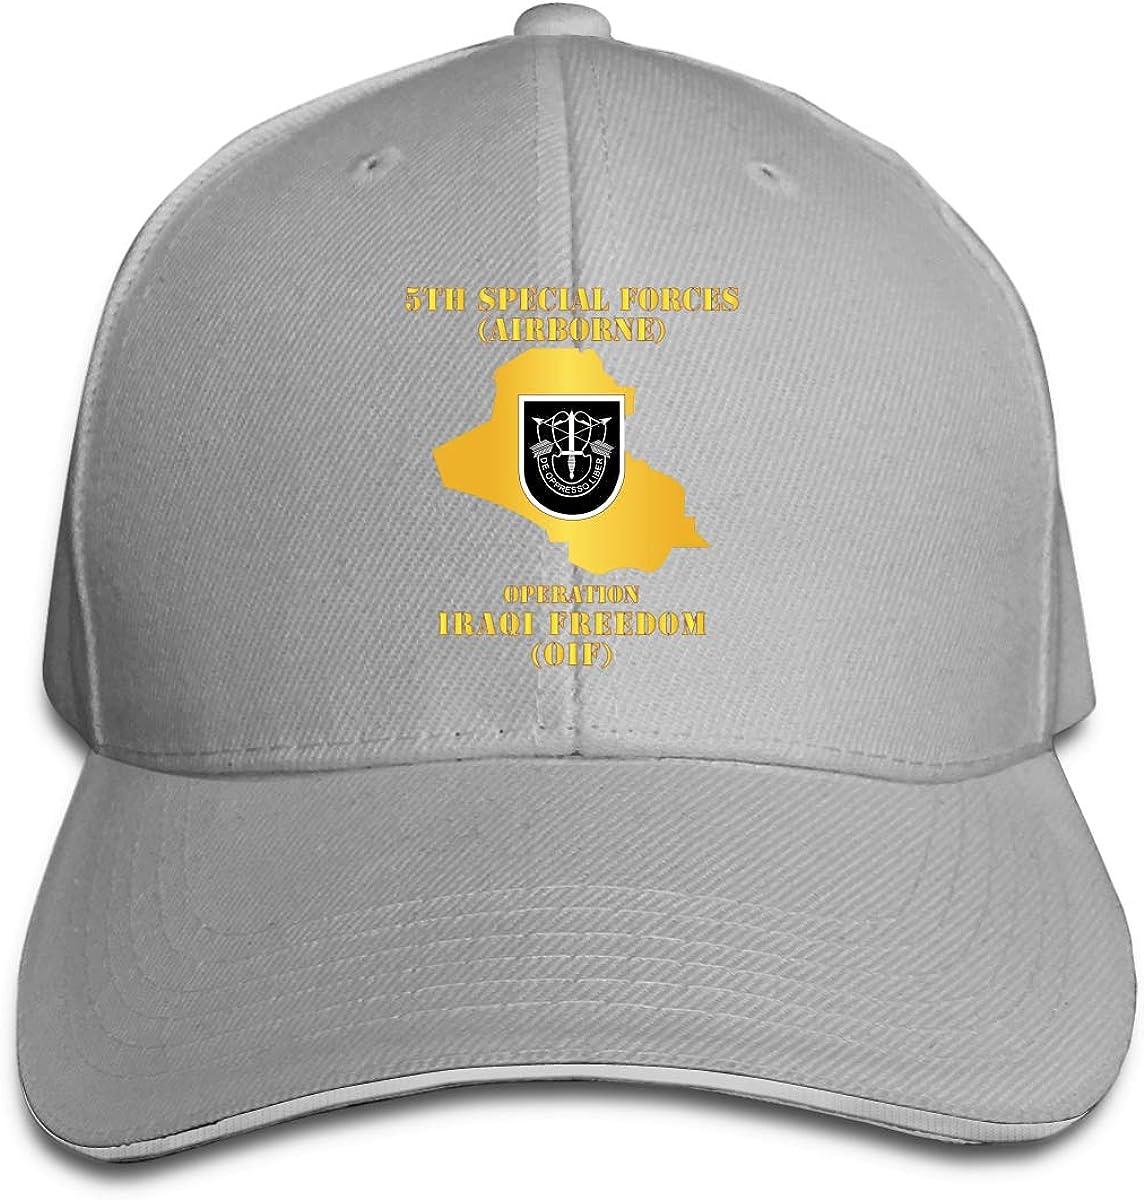 5th SFG OIF Map Adjustable Baseball Caps Vintage Sandwich Hat